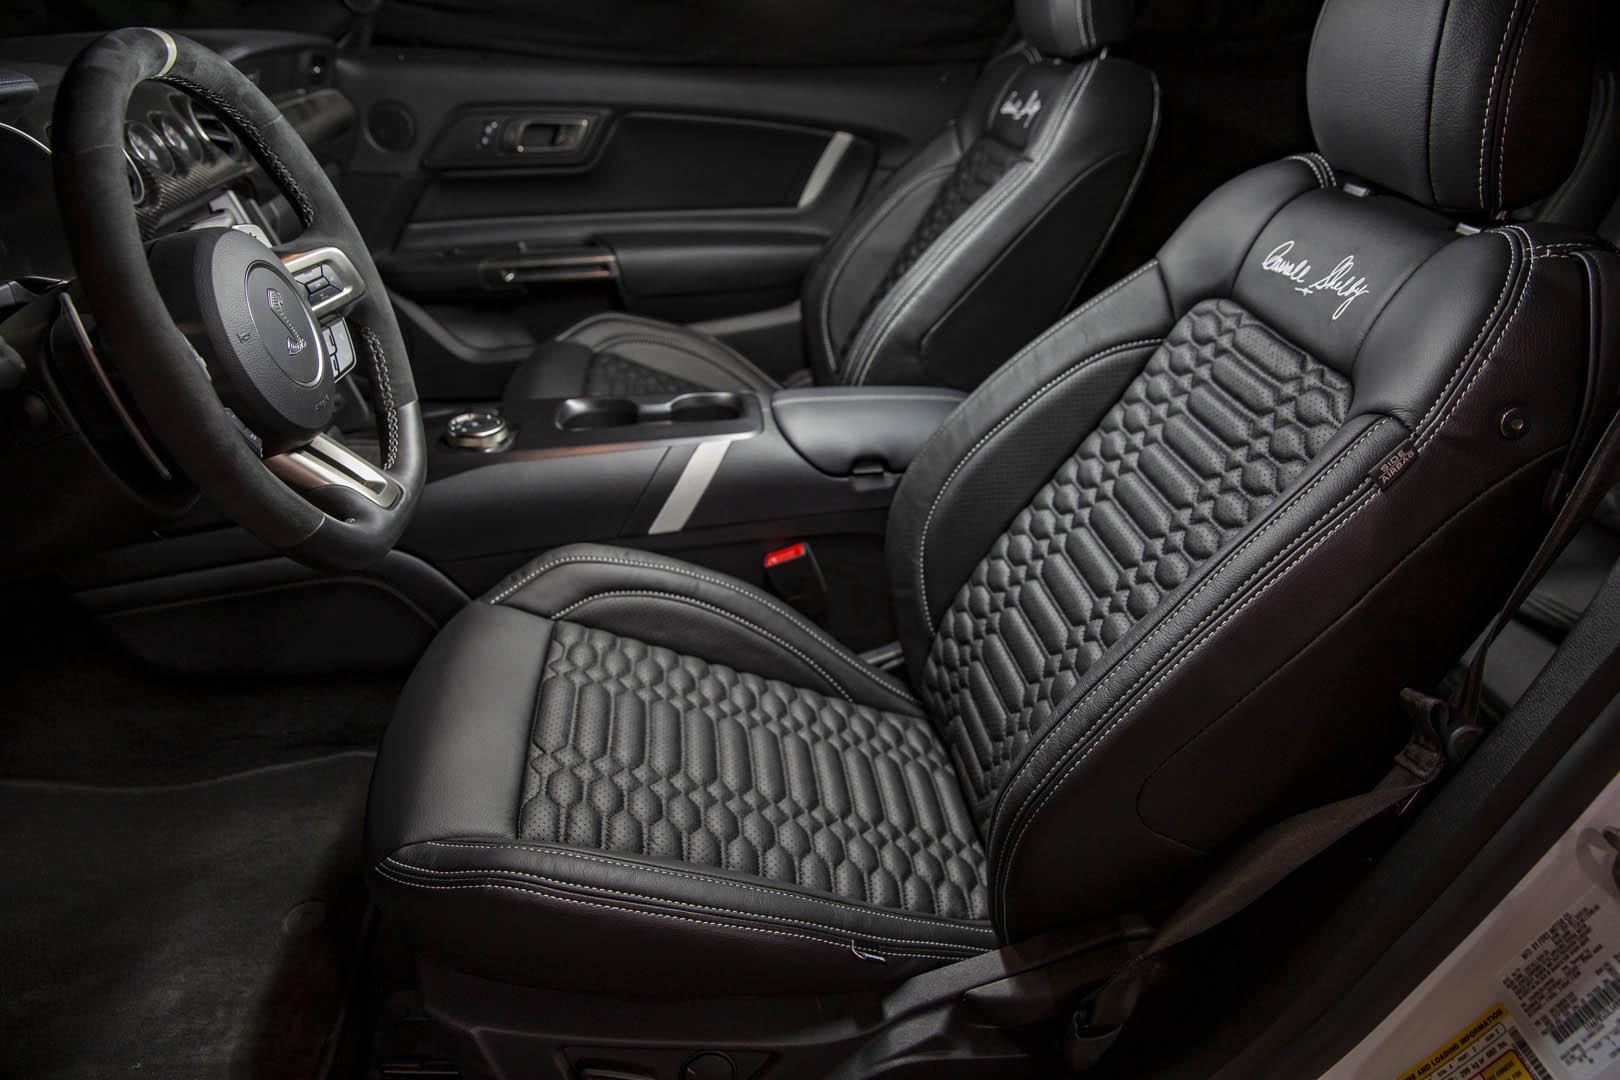 2021 Shelby GT500SE interior